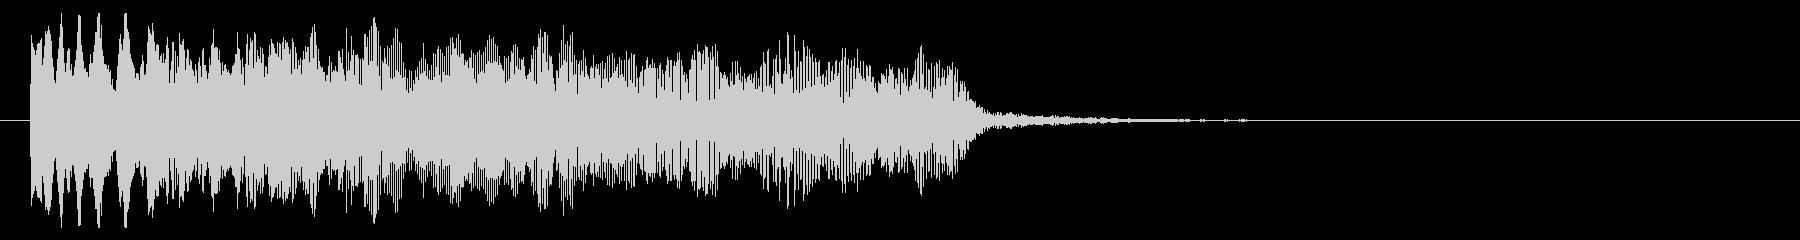 8bitパワーdown-01-4_revの未再生の波形